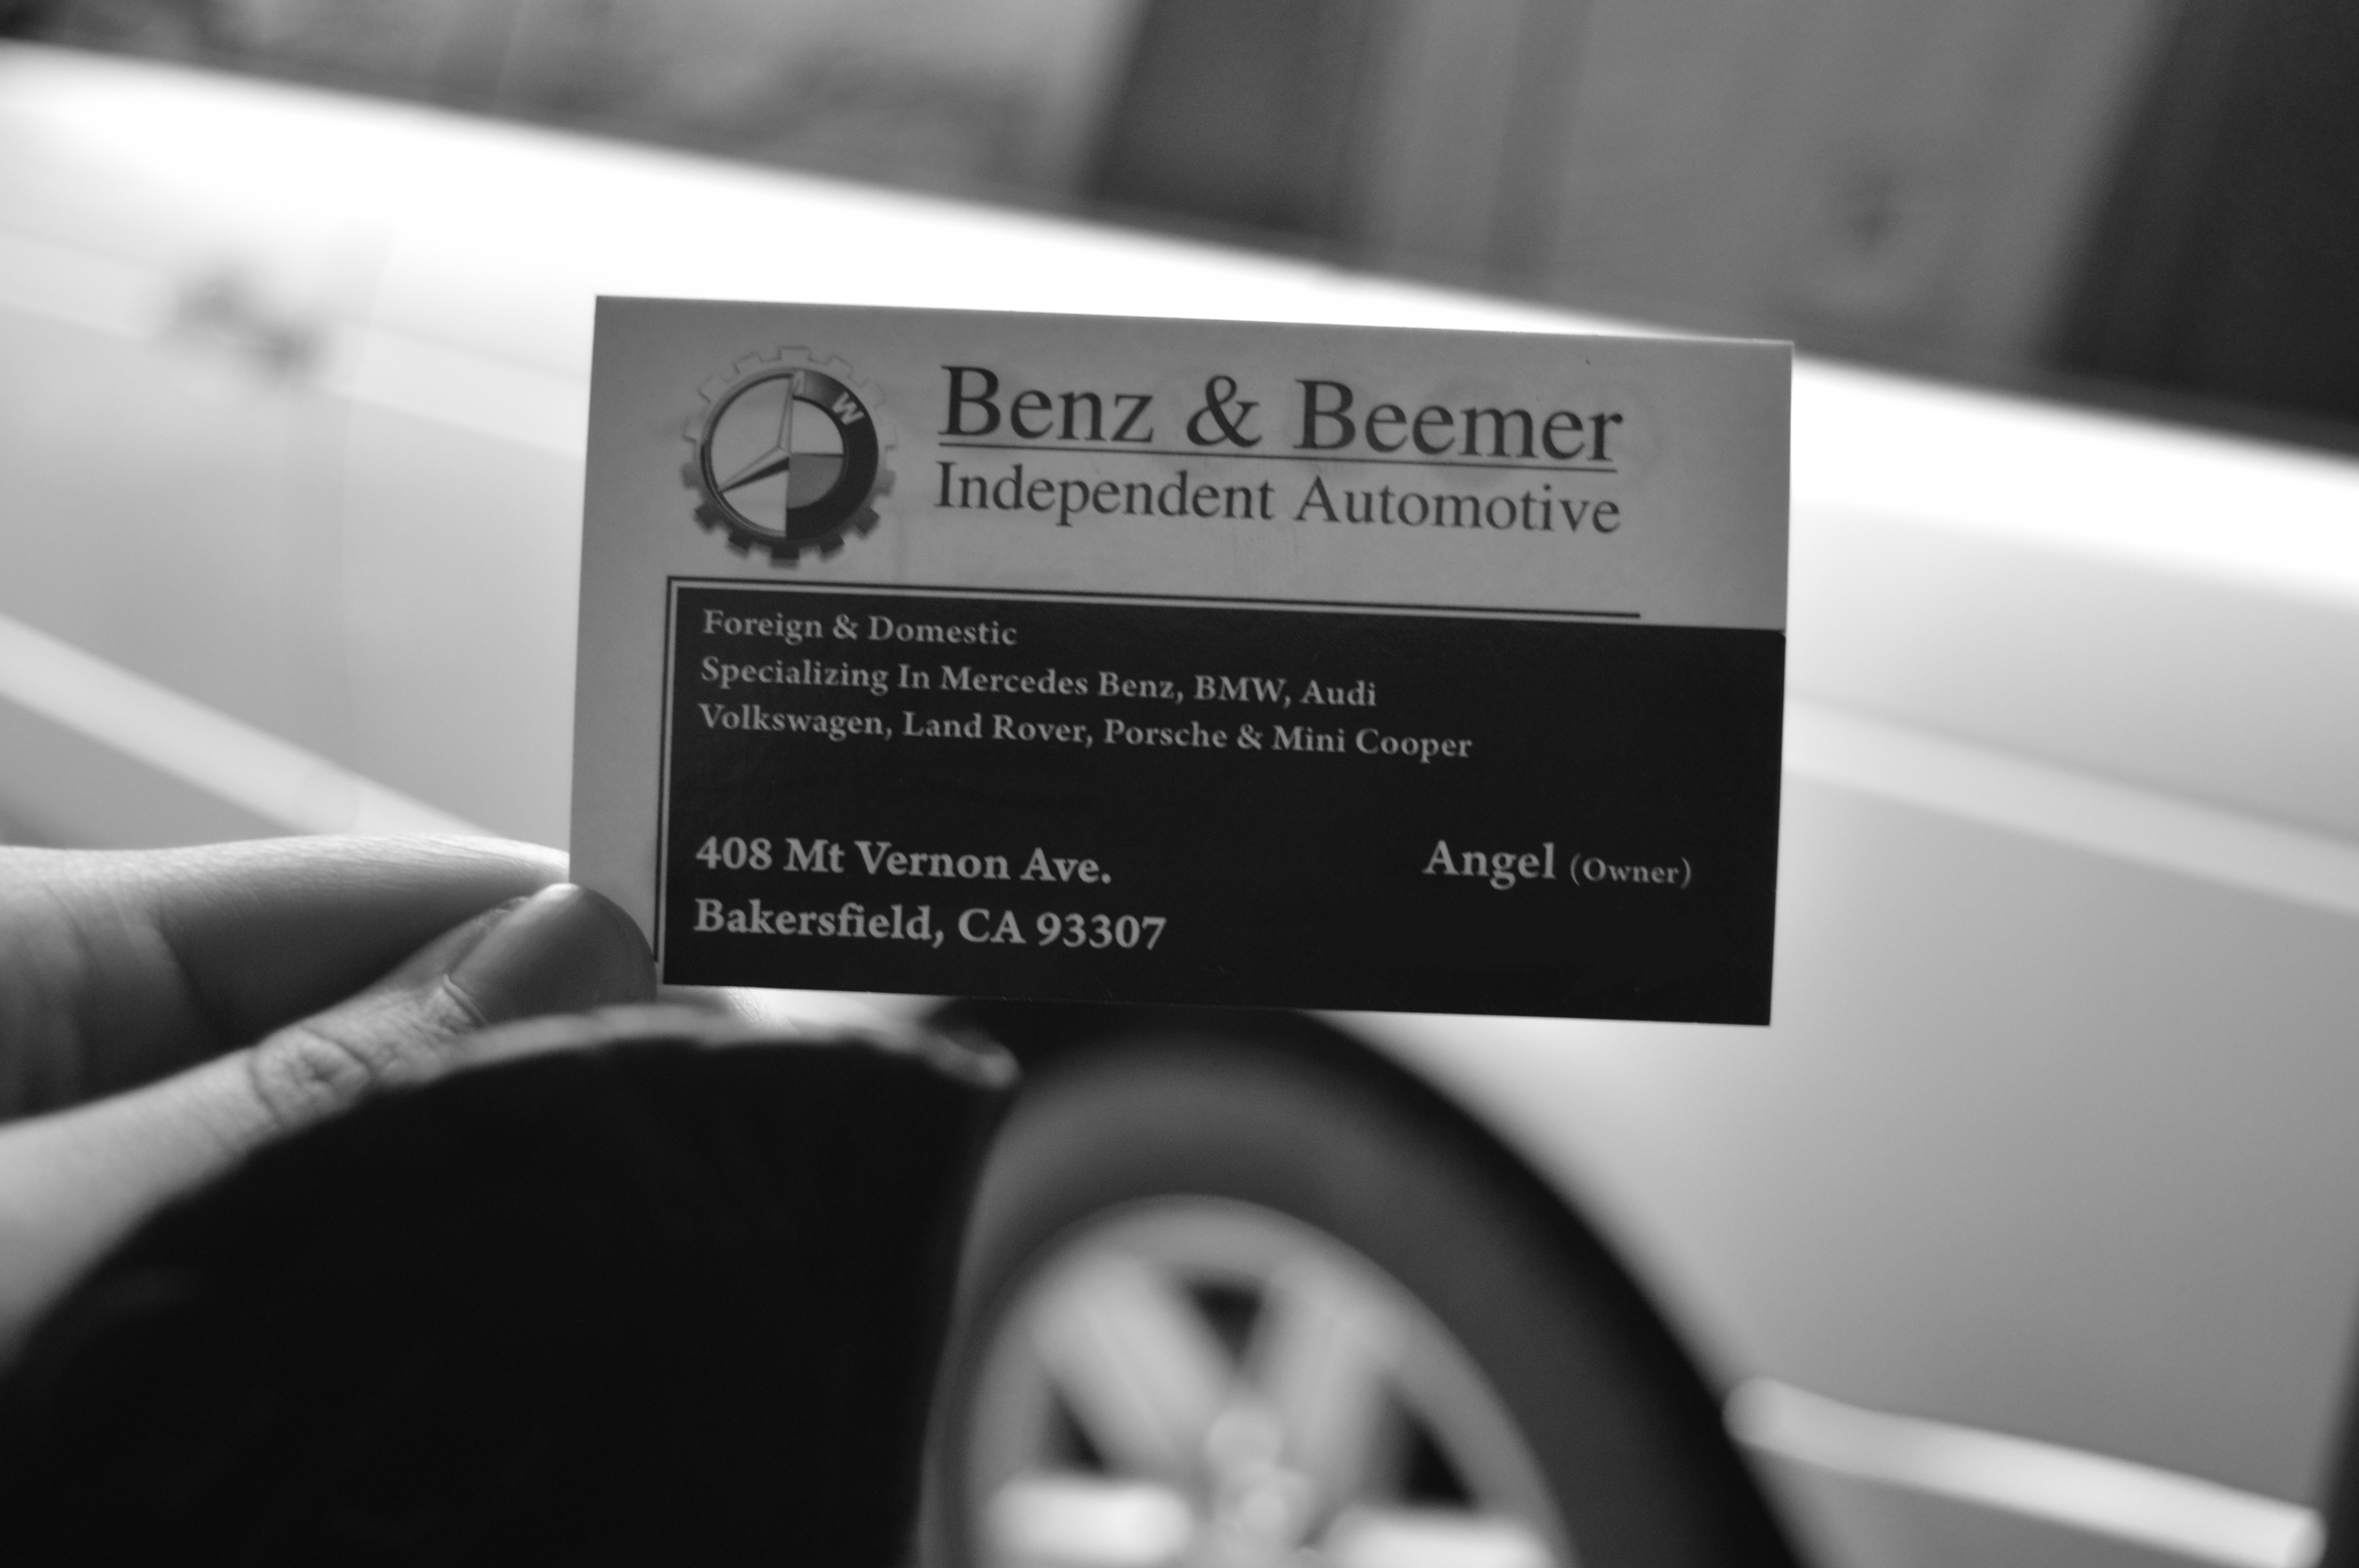 Benz & Beemer Independent Automotive 408 Mount Vernon Ave